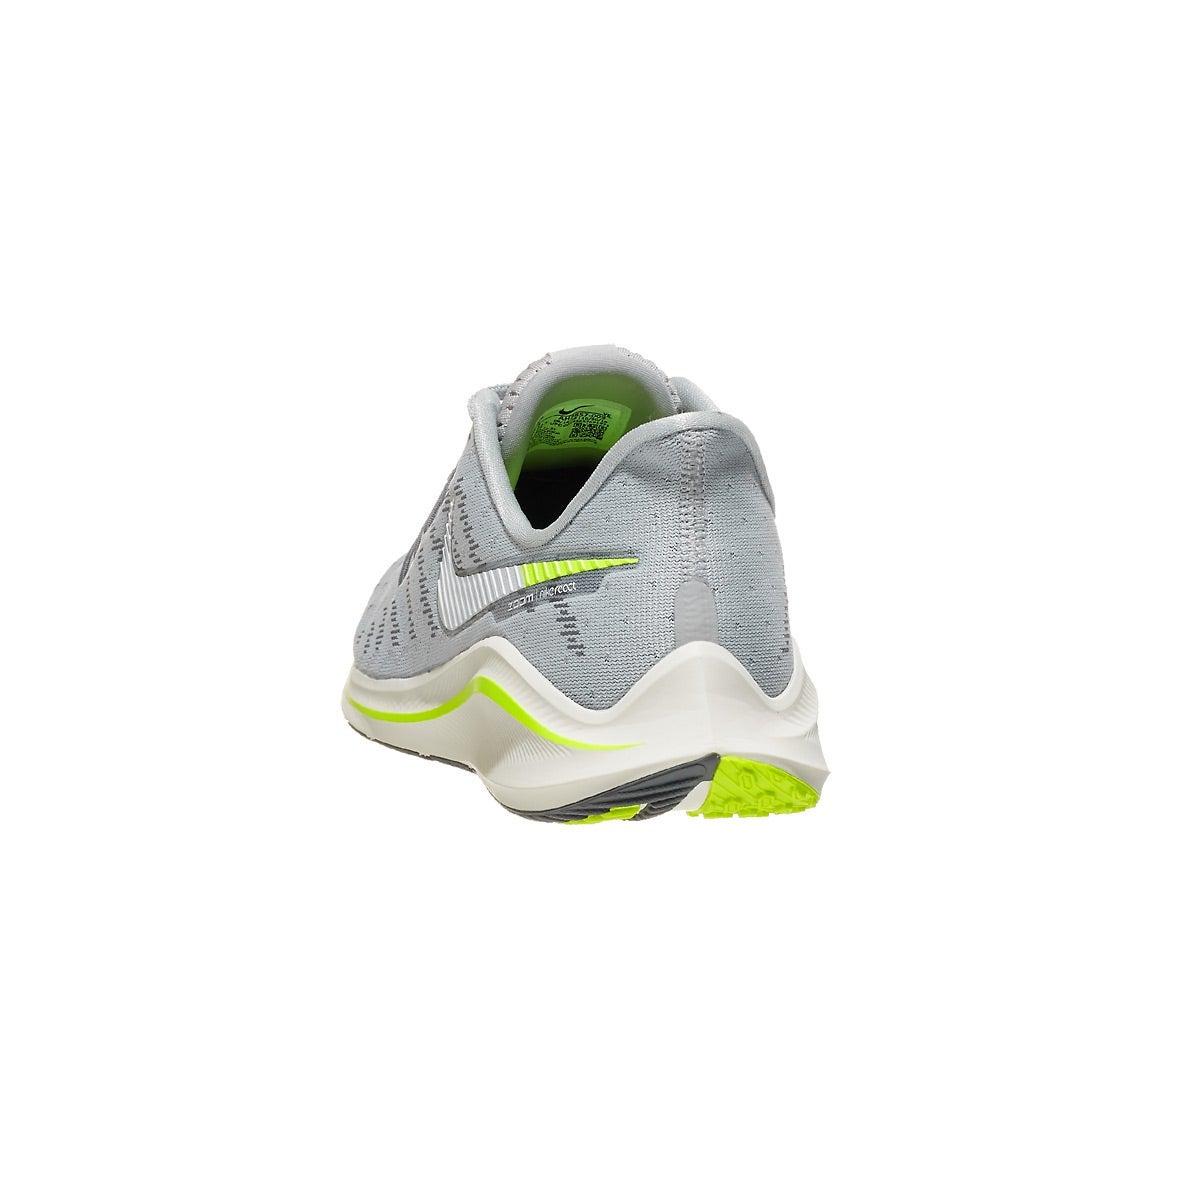 Nike Zoom Vomero 14 Men's Shoes Grey